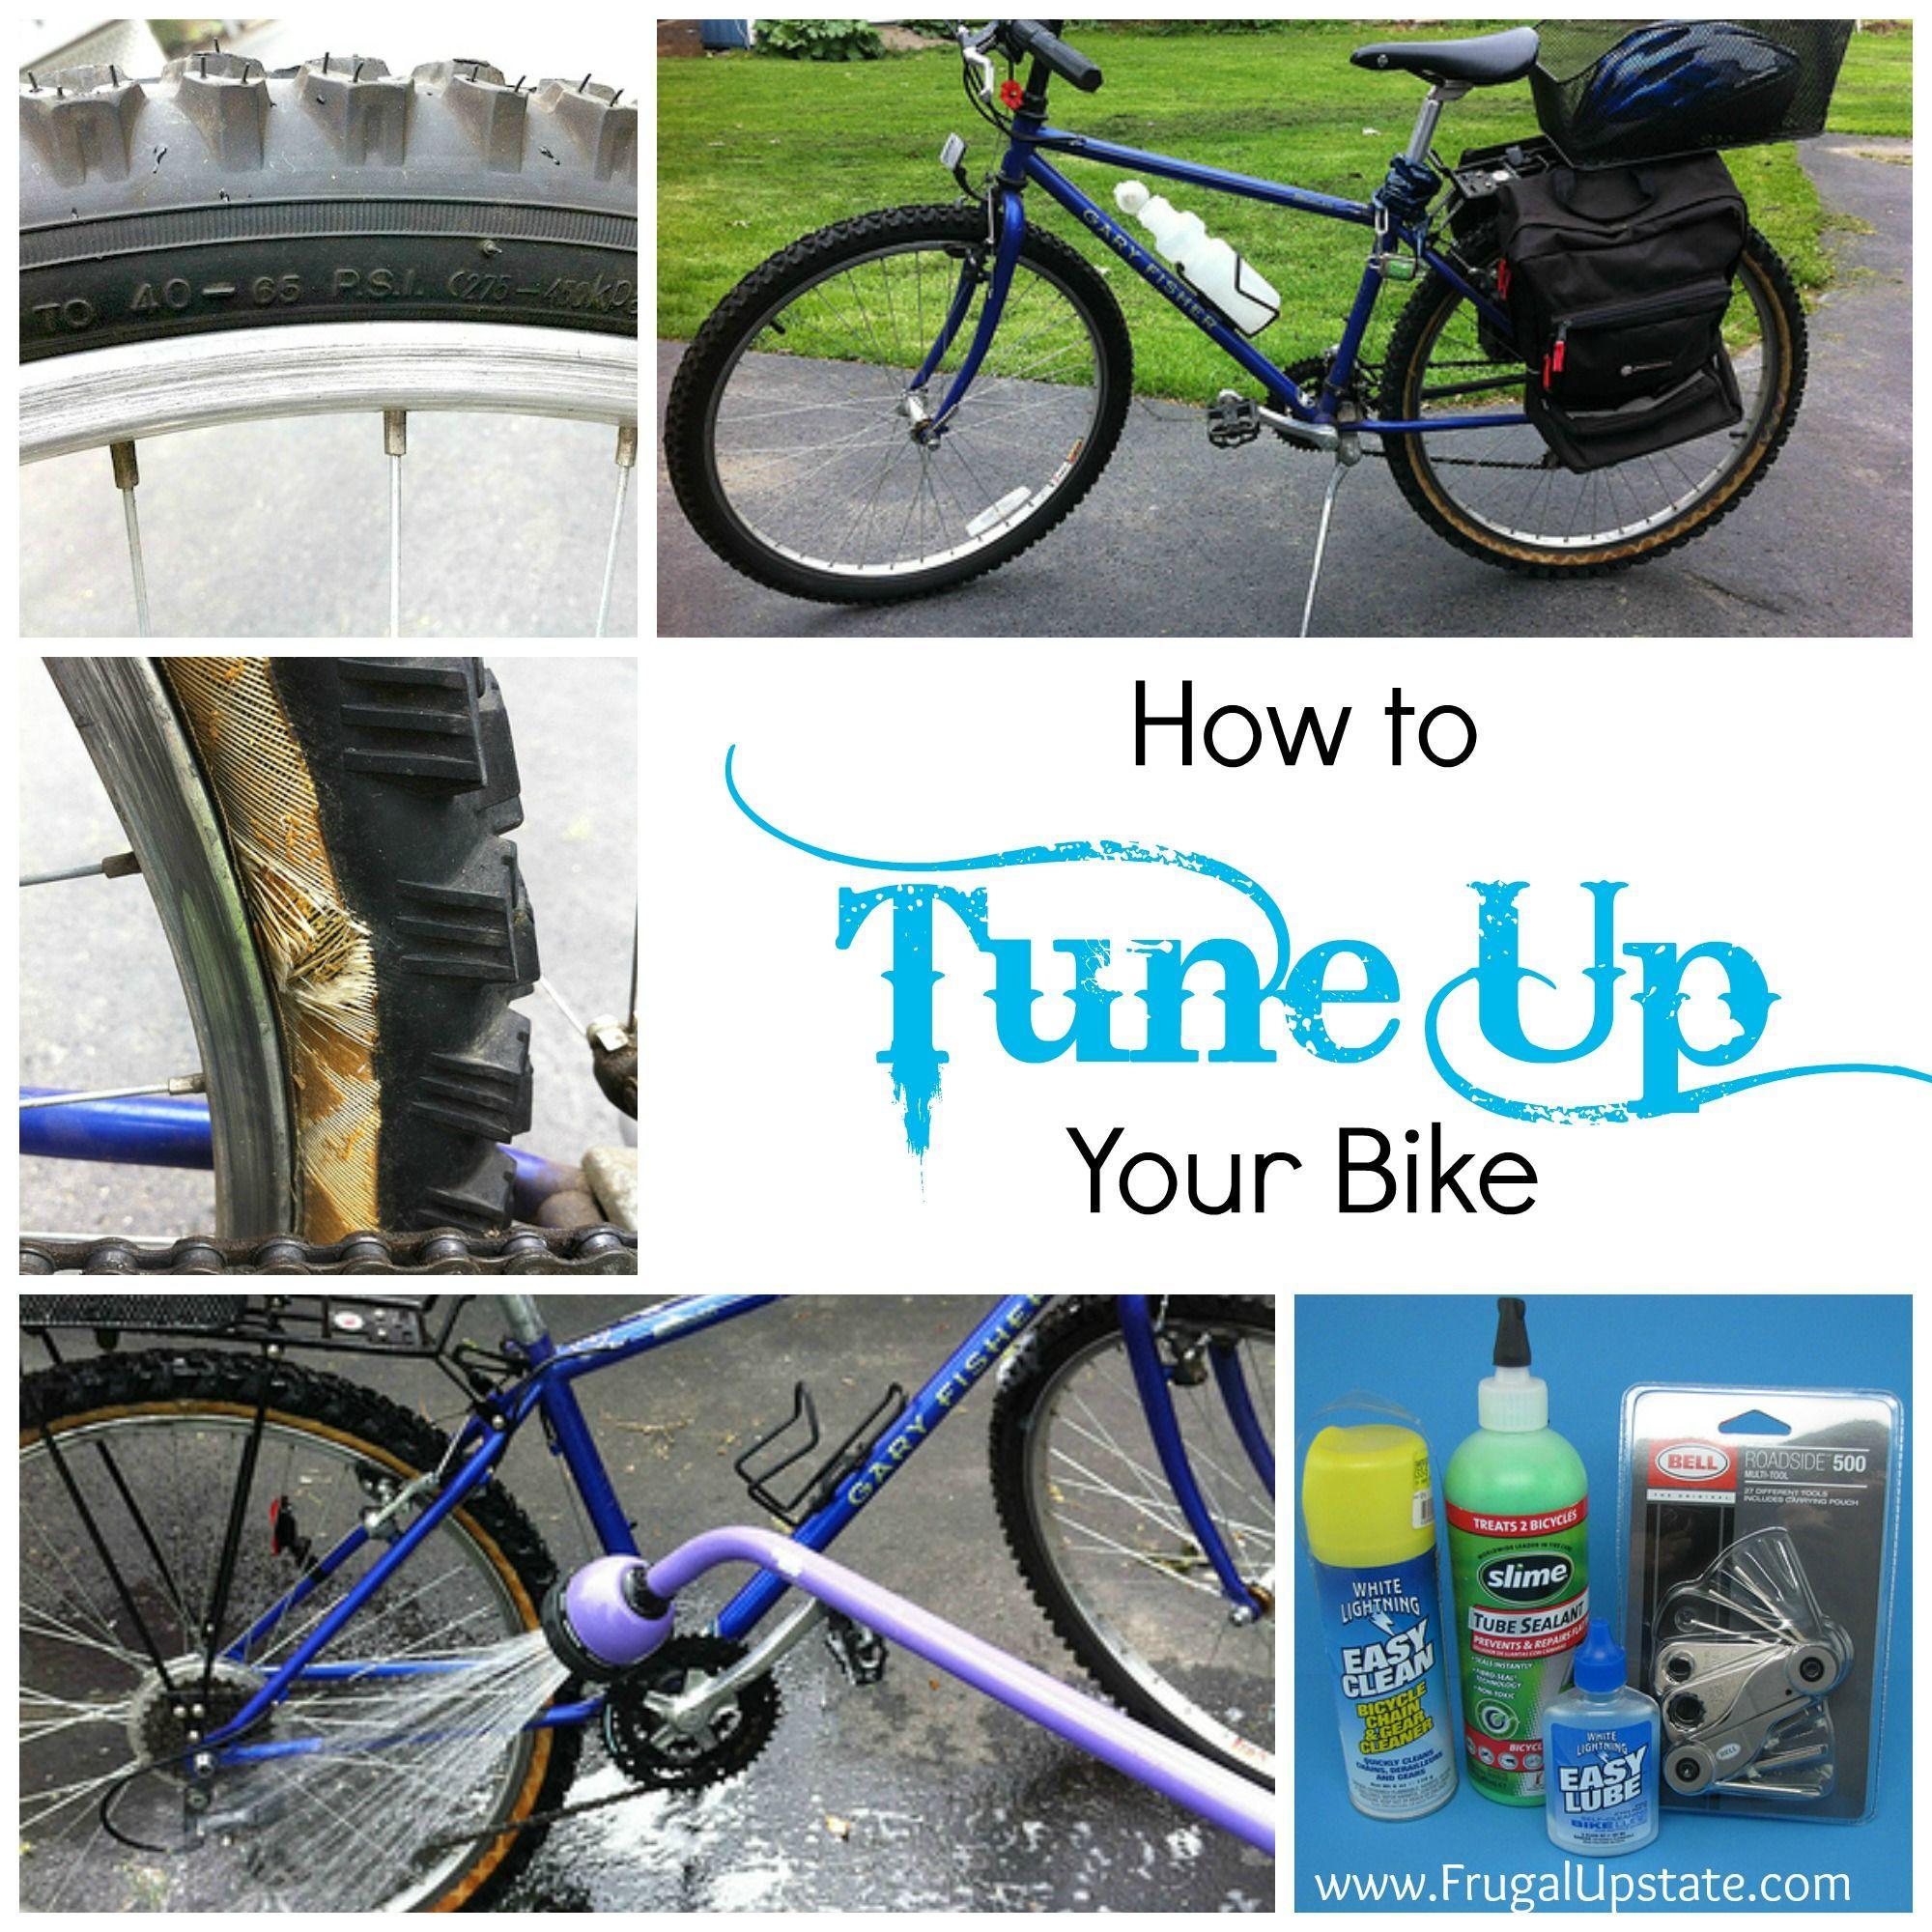 How To Tune Up Your Bike Bike Repair Bike Restoration Biking Diy